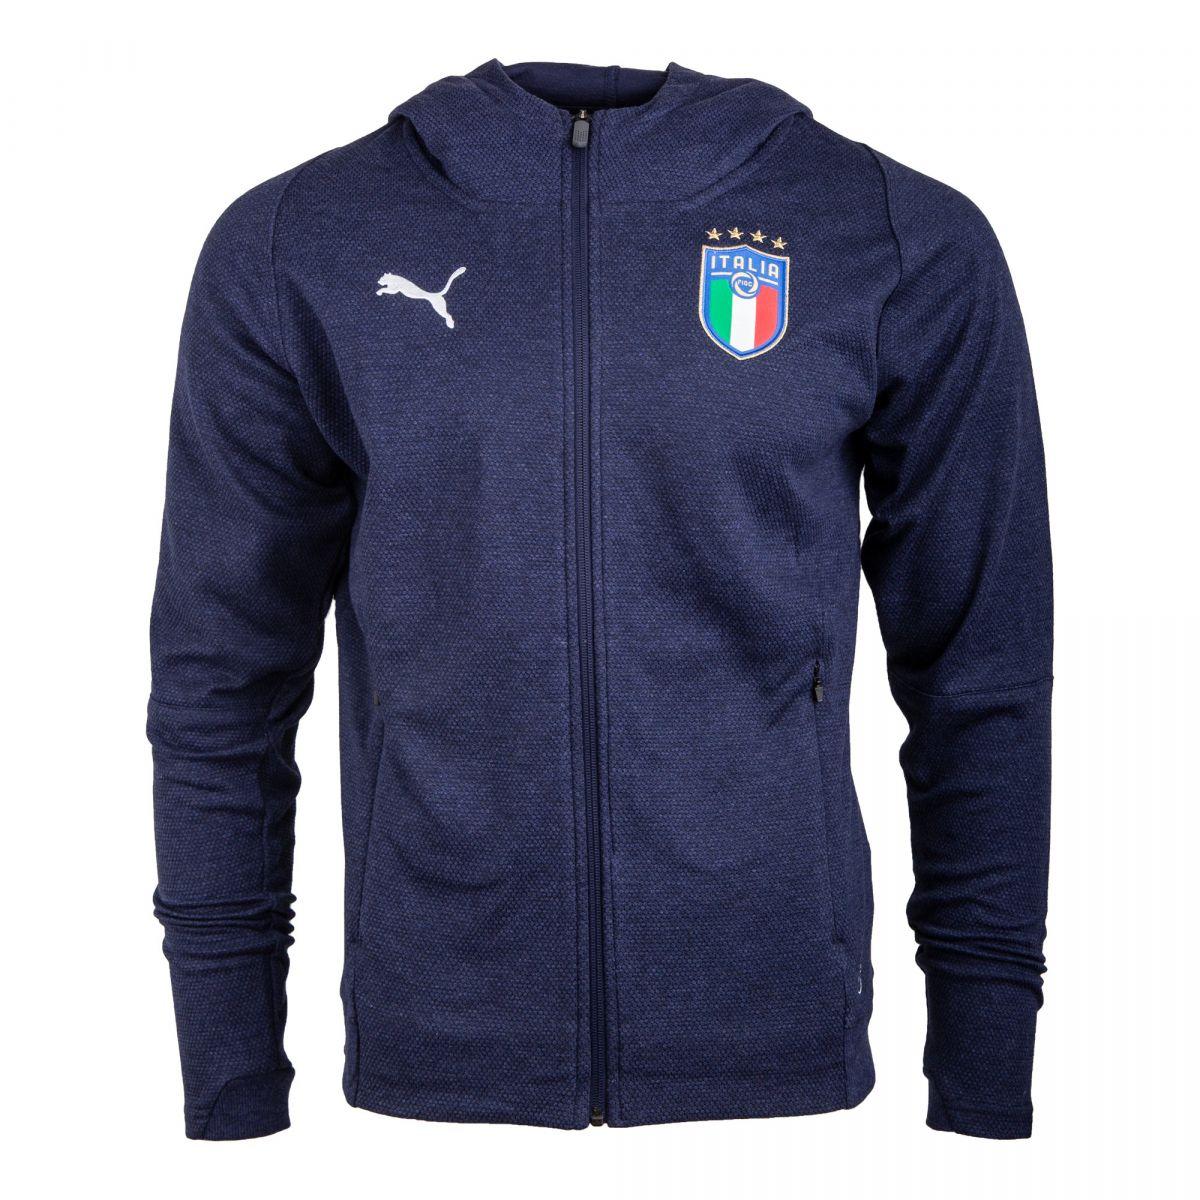 Jacket-Tracksuit-Italy